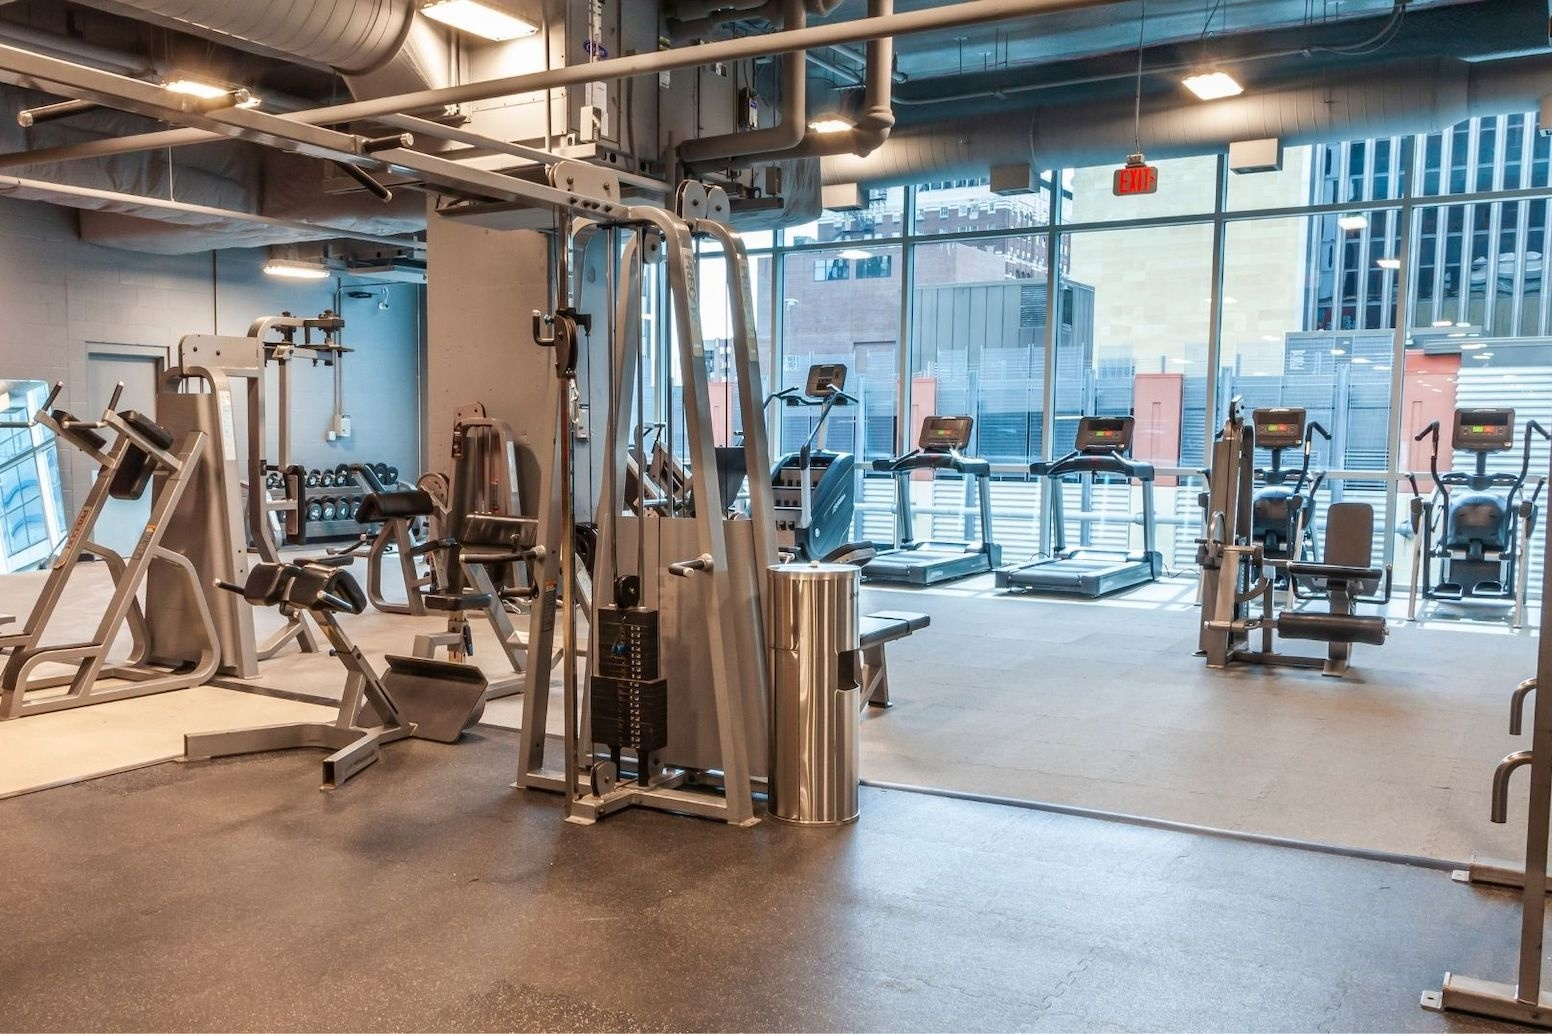 Fitness Center in St. Paul Finish Line Wellness